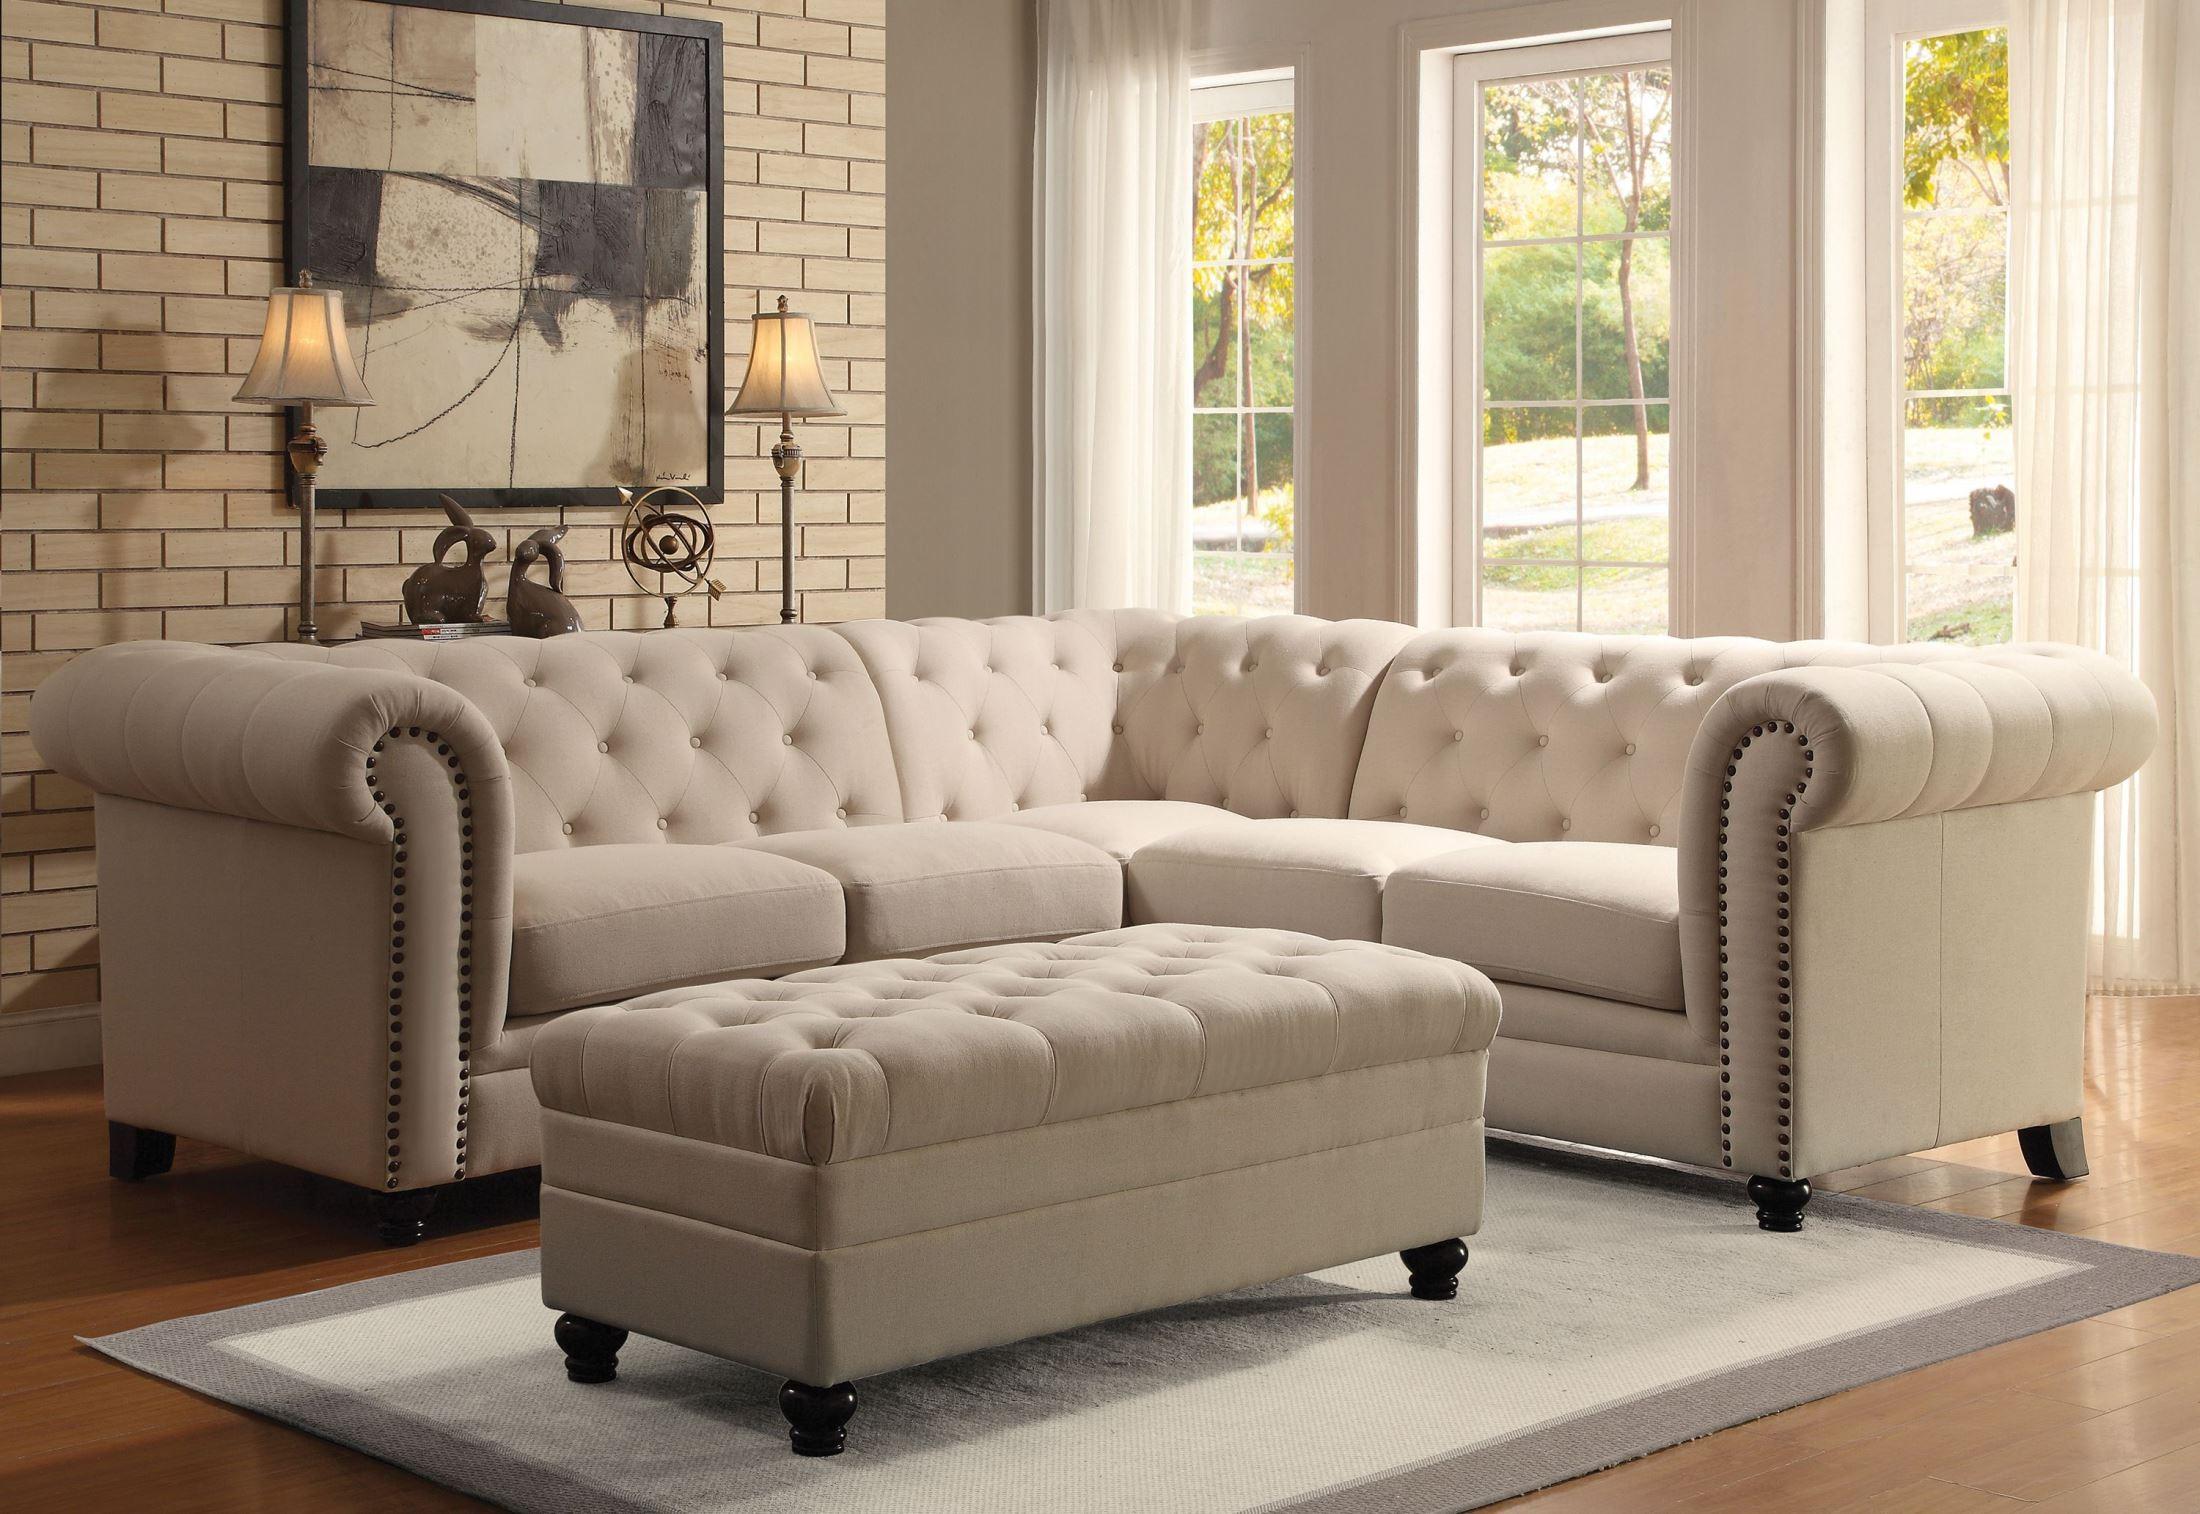 oatmeal sofa set italian sofas preston roy sectional from coaster 500222 coleman